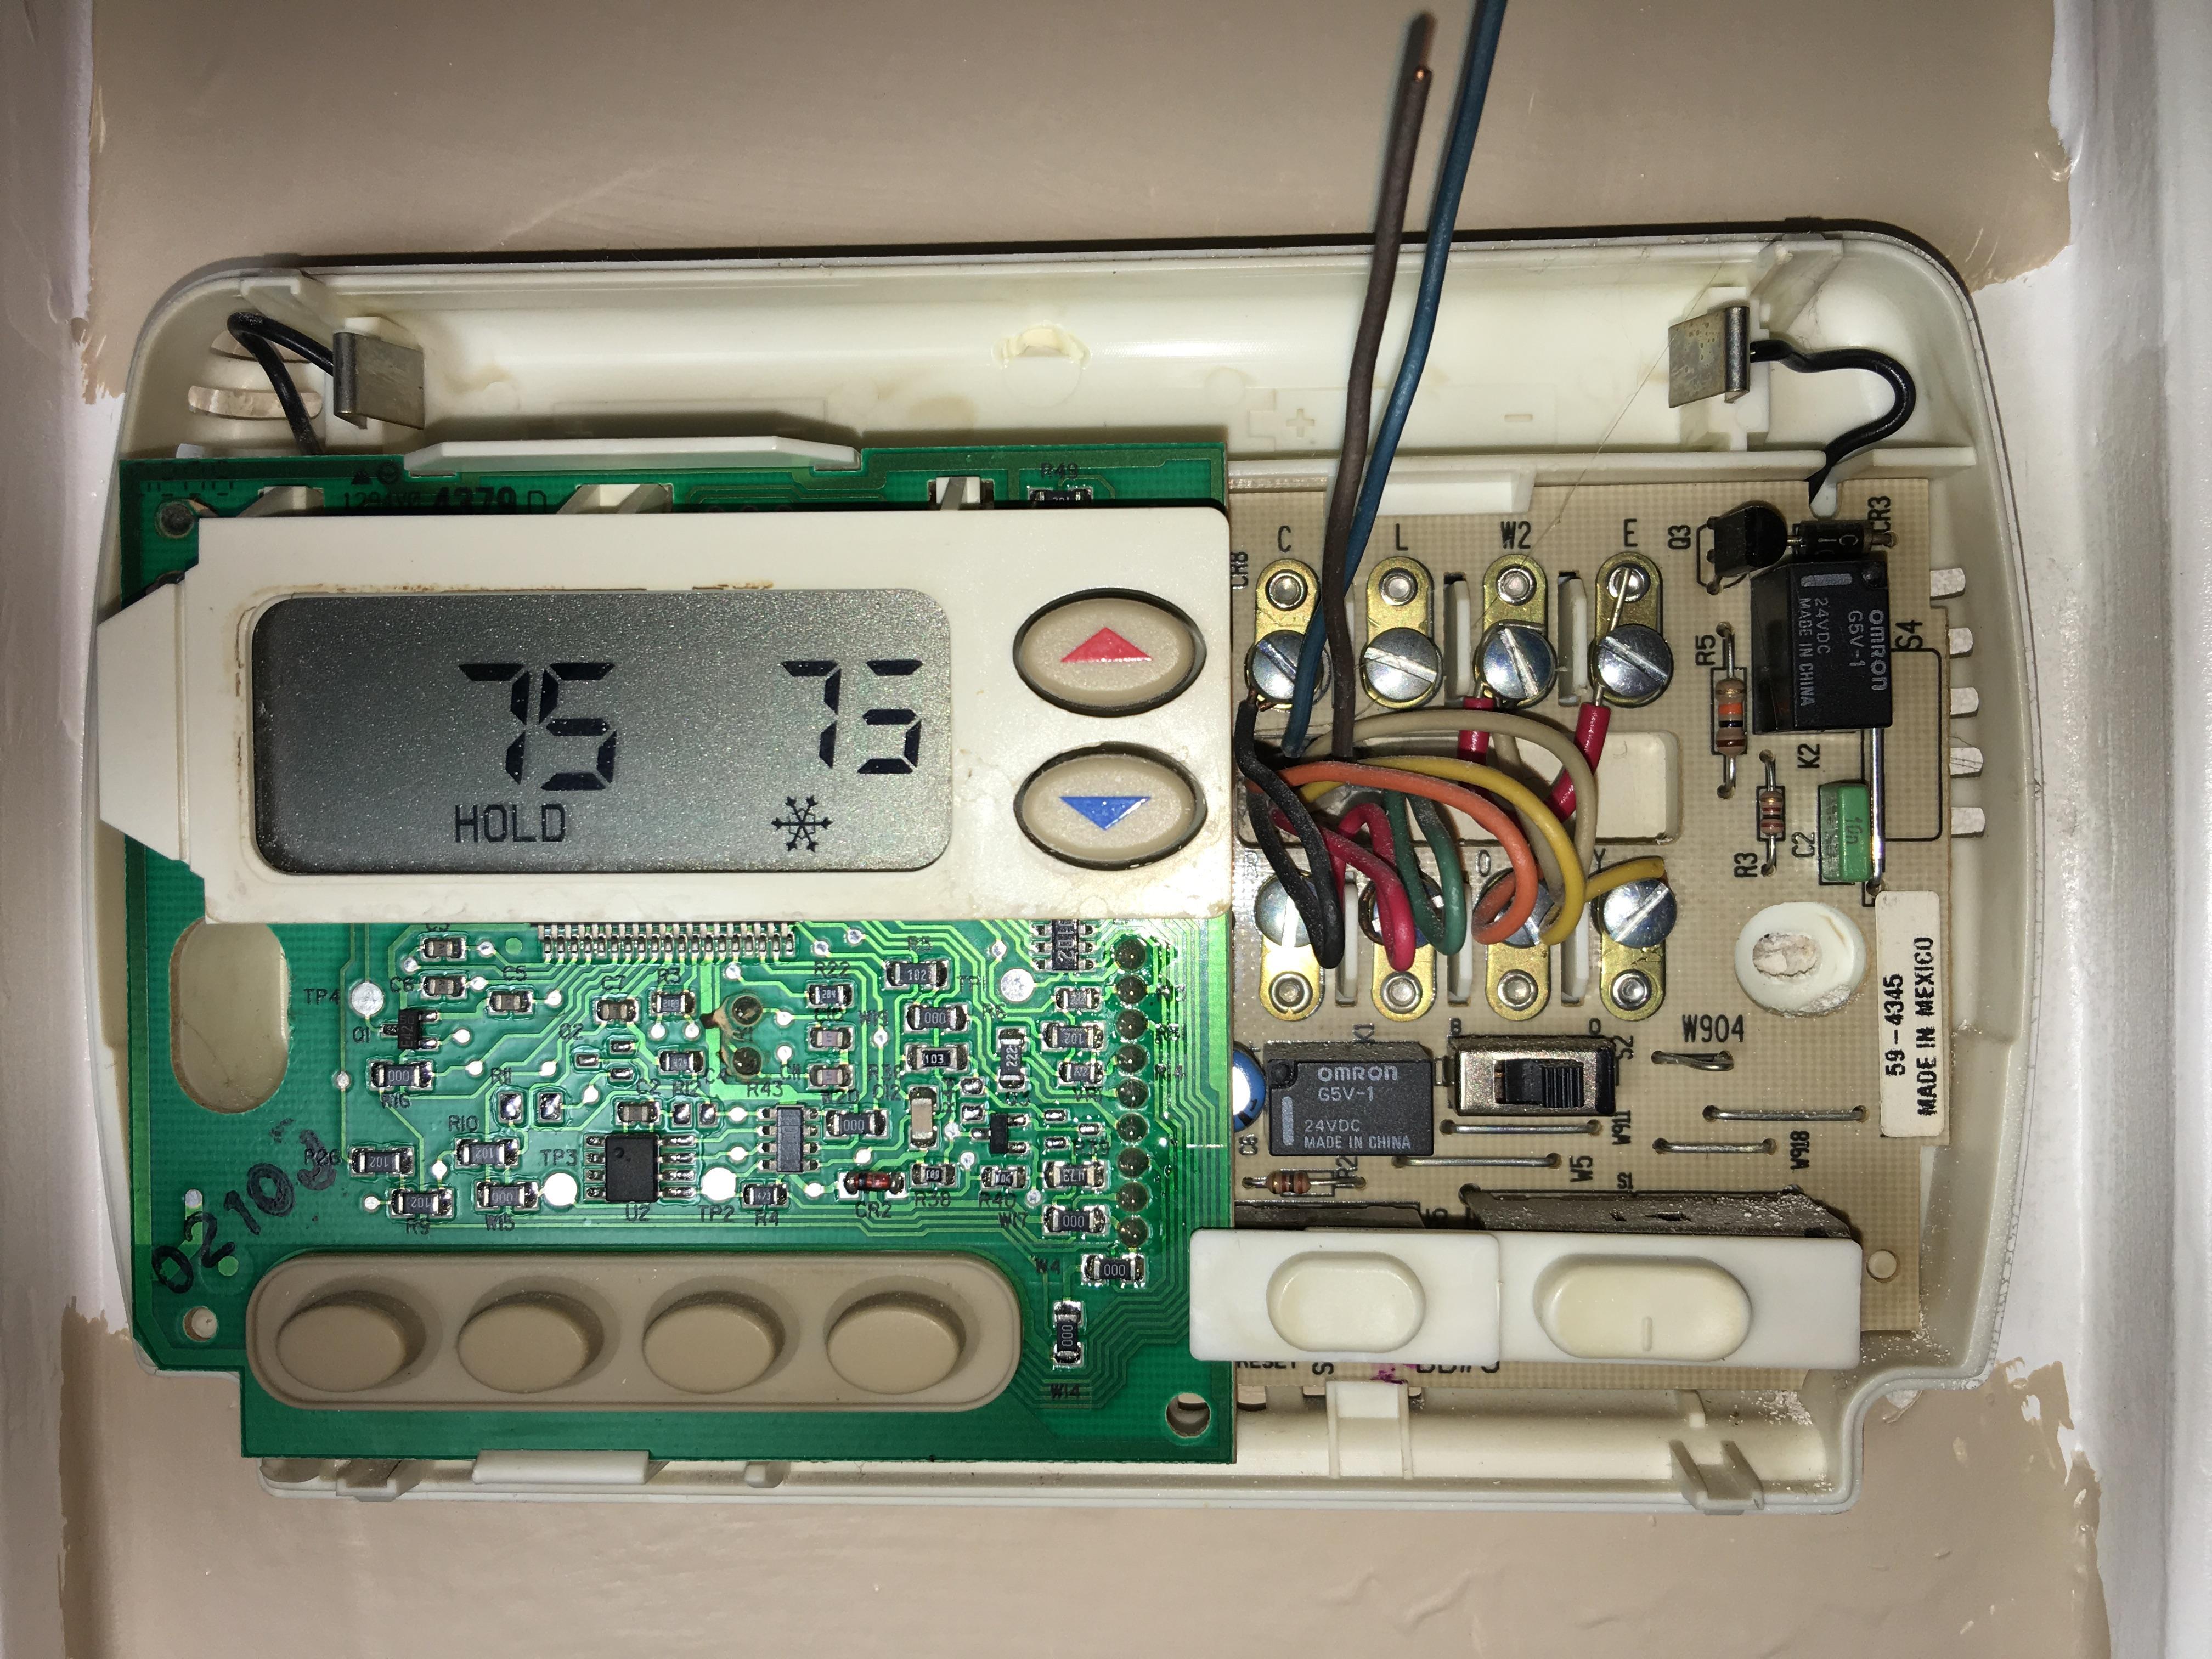 HELP Nest Thermostat E Install DUAL FUEL? : Nest